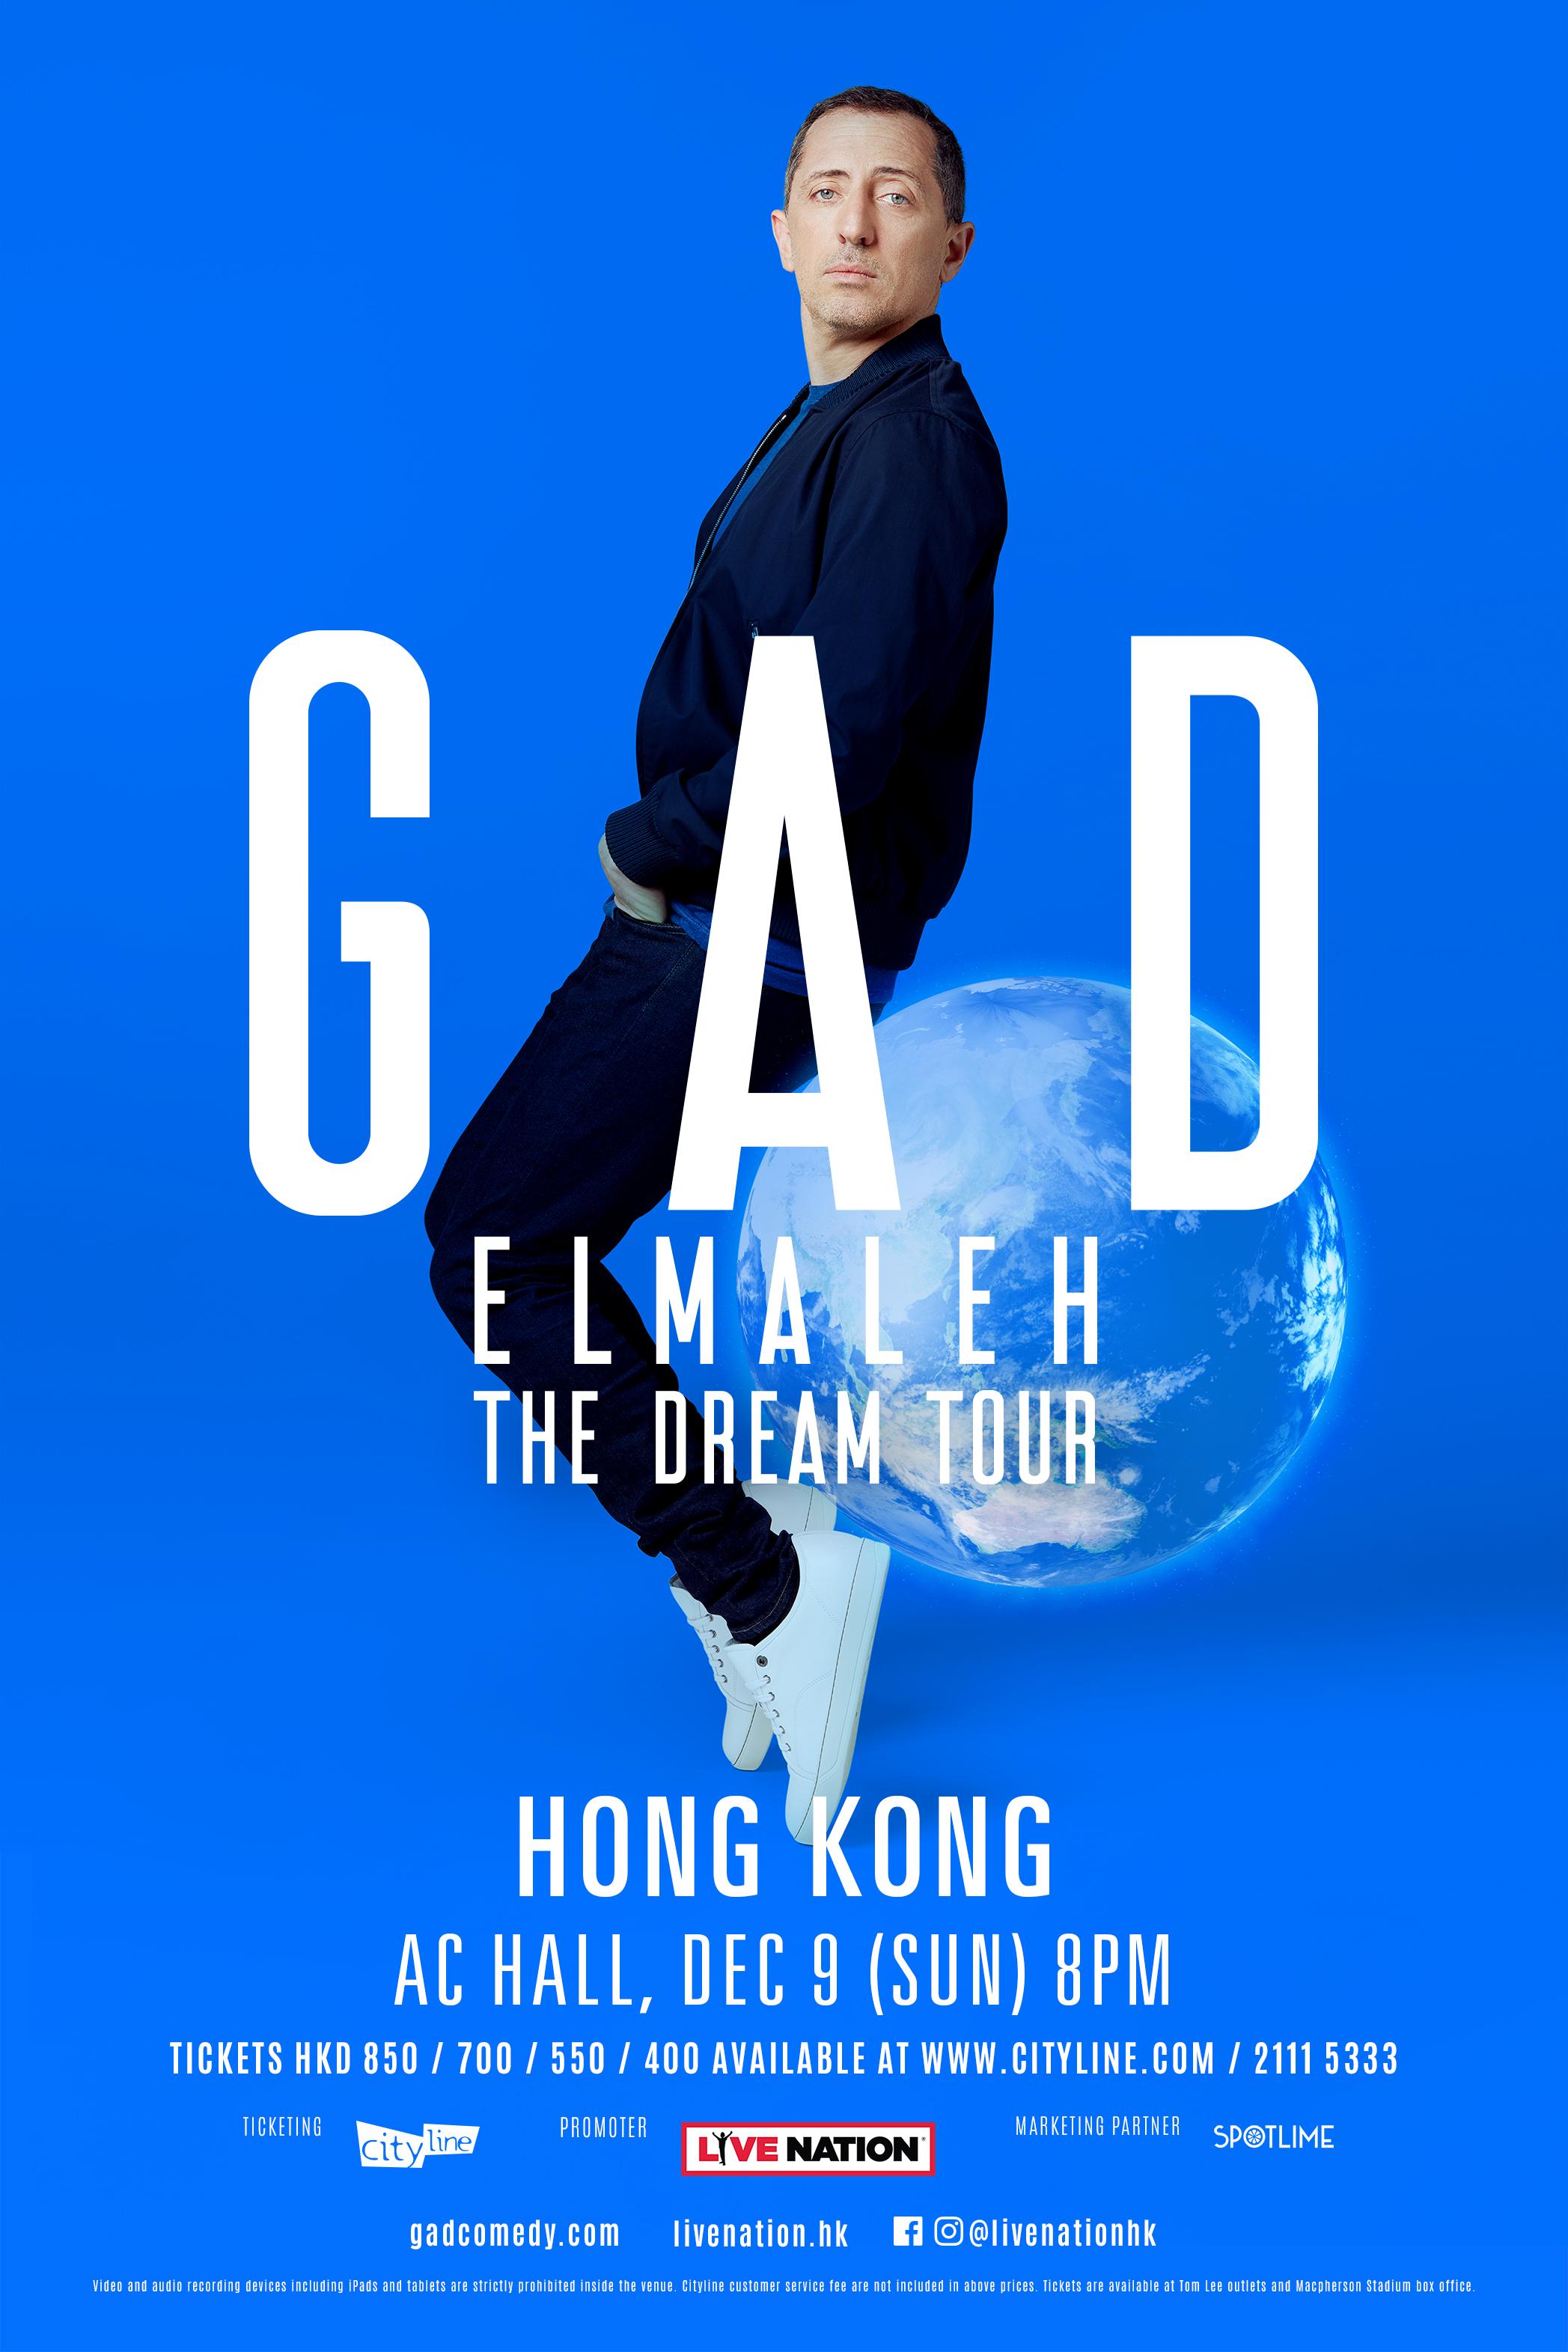 gad_thedreamtour_hk